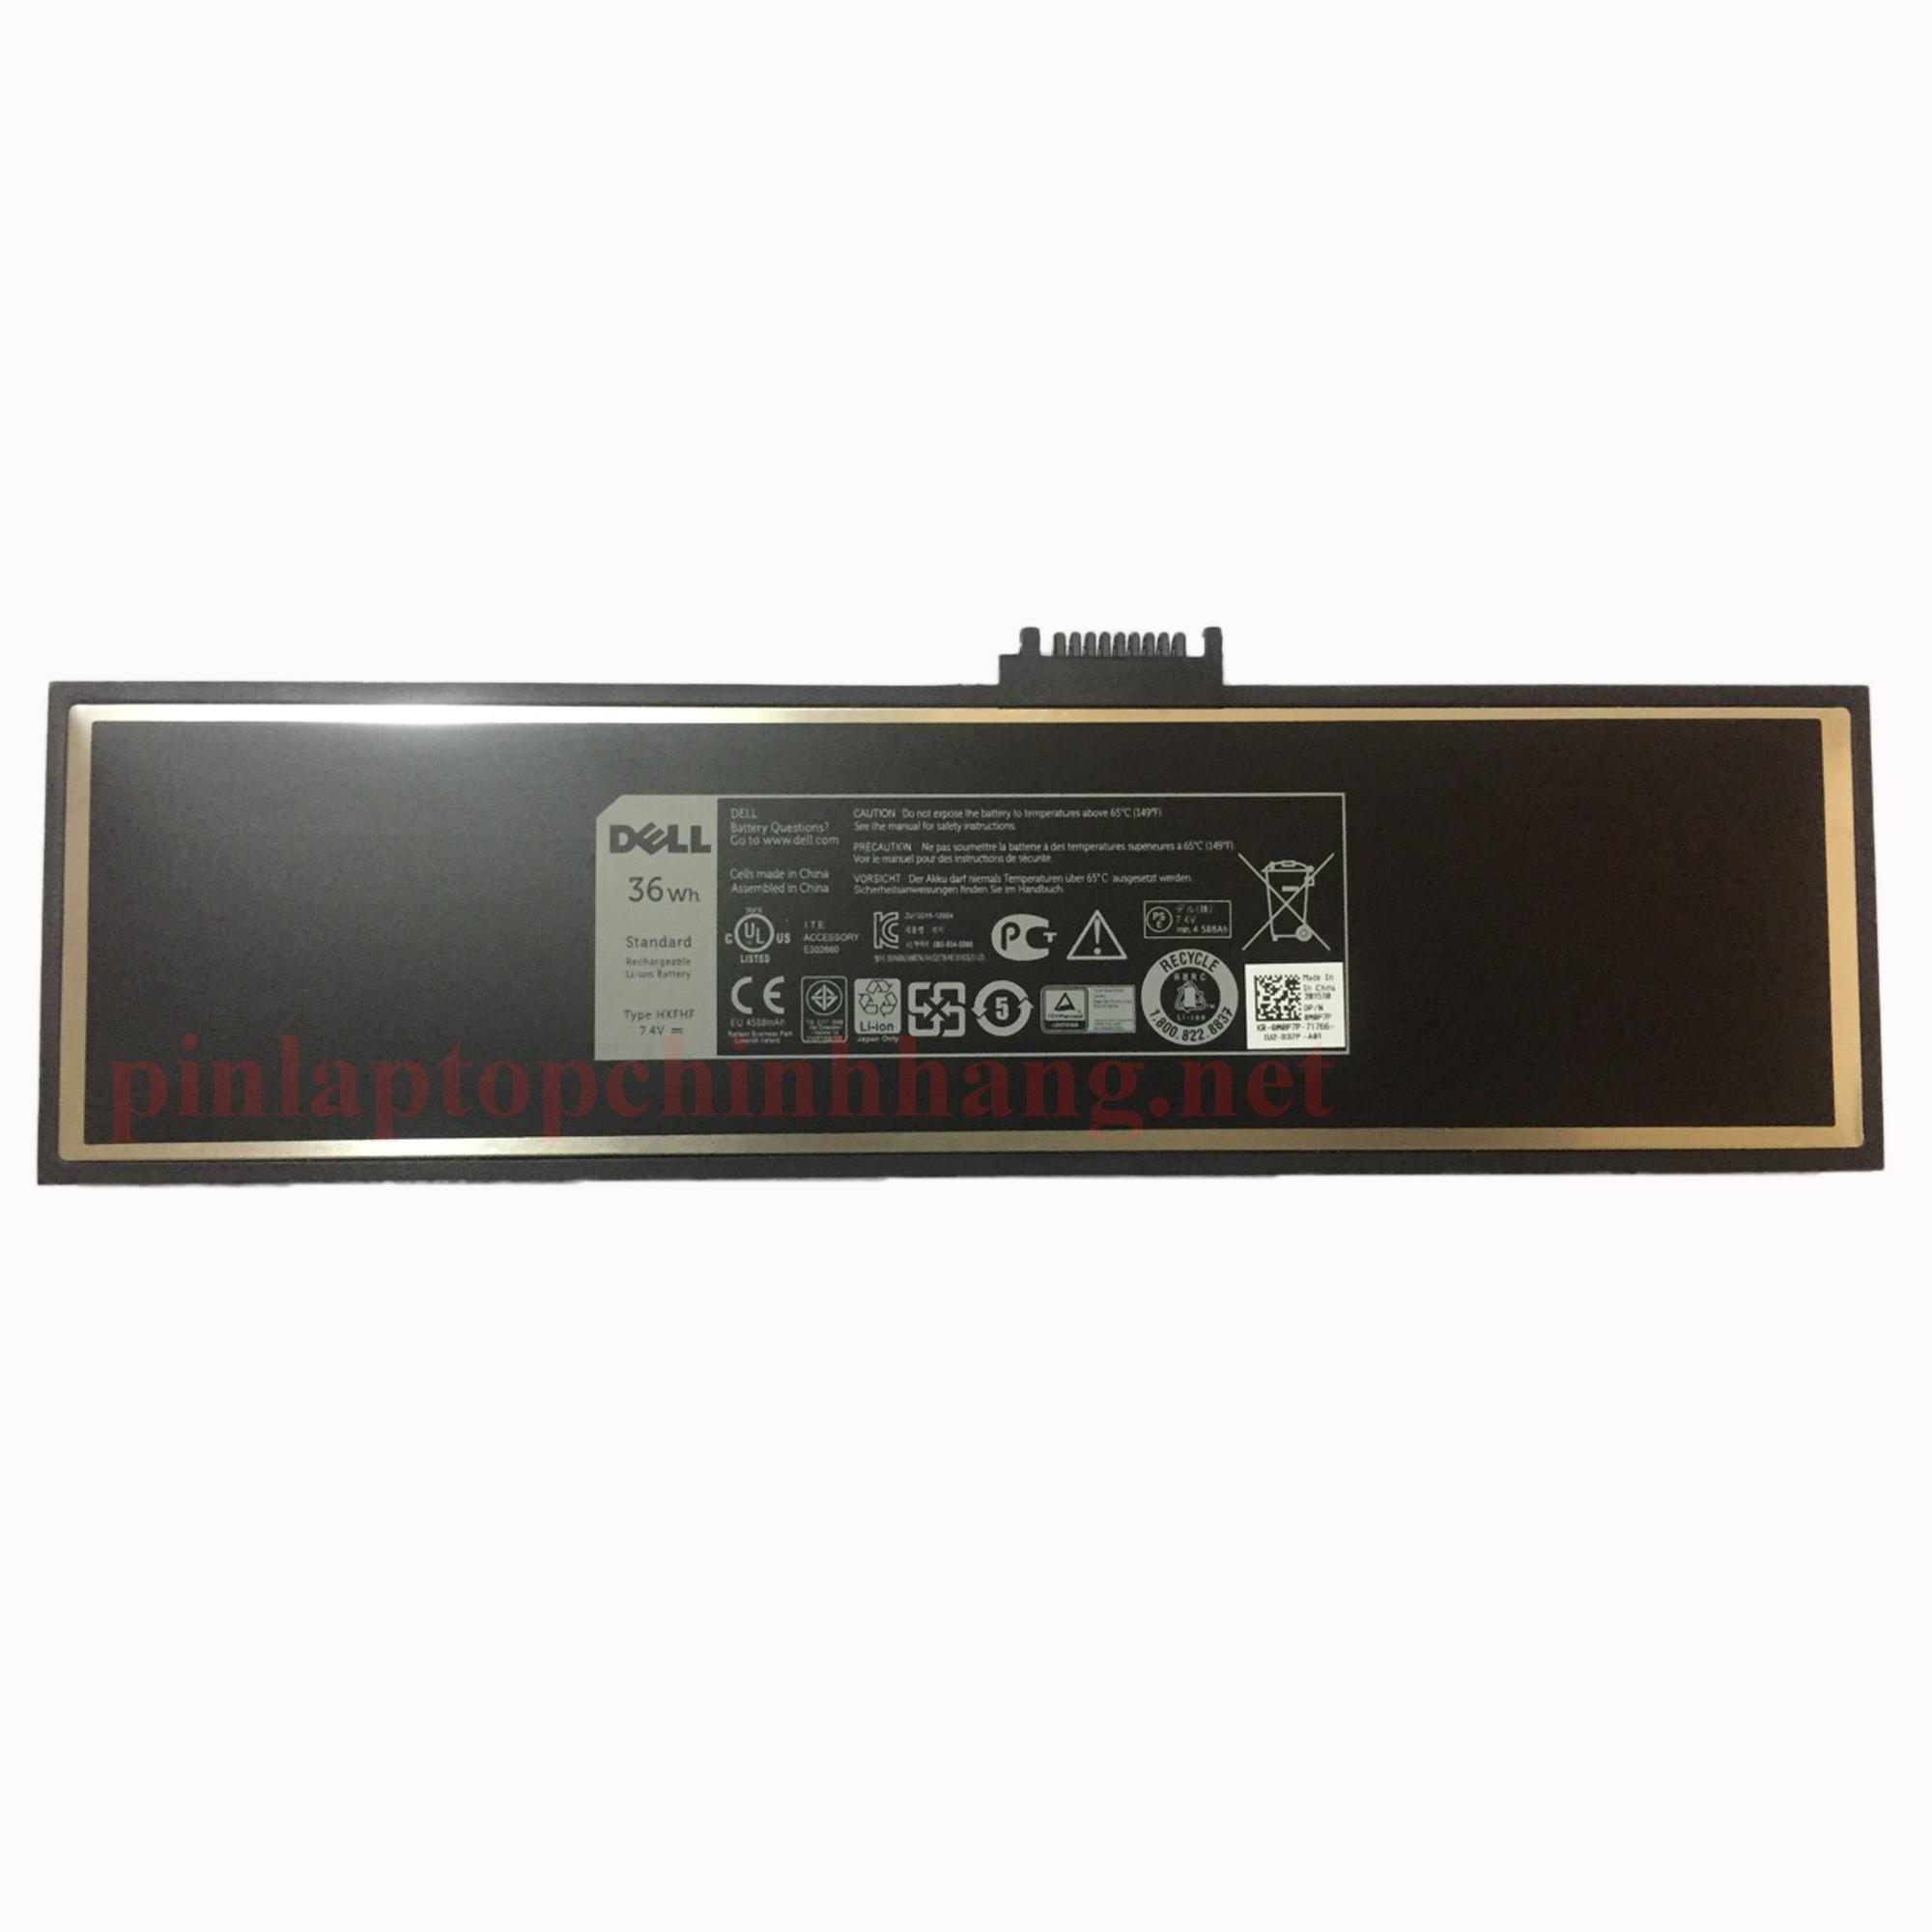 Battery (Pin) Dell Venue Pro 11 7130 7139 HXFHF  VJF0X VT26R XNY66 (7.4V 36Wh) Chính Hãng